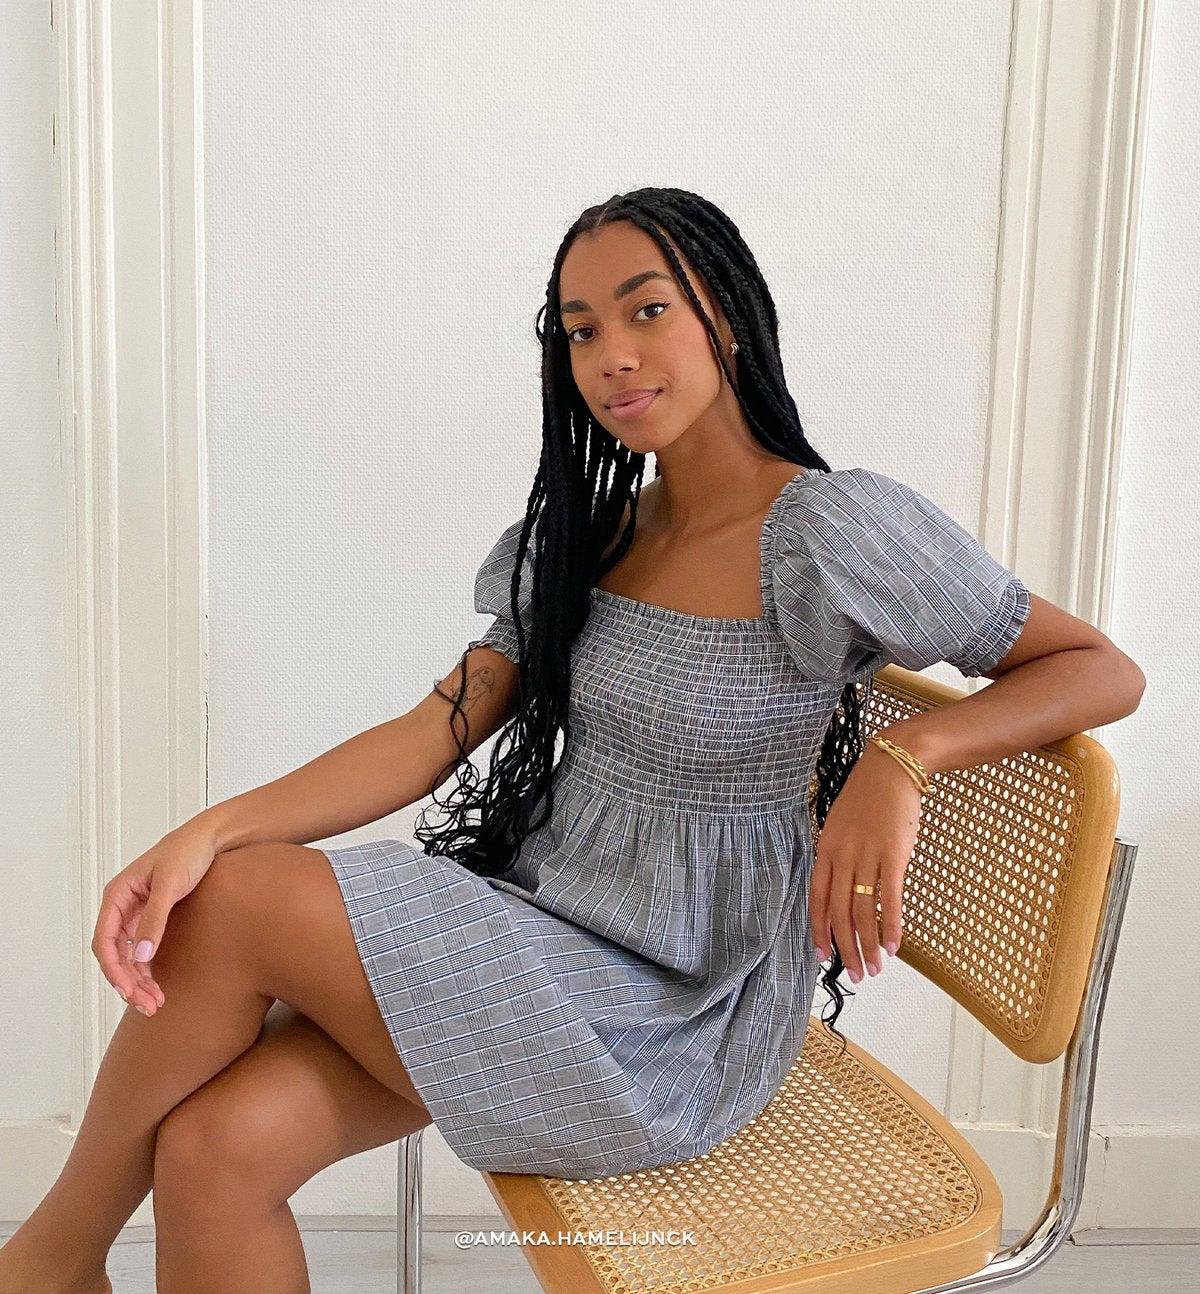 model wearing a mini dress